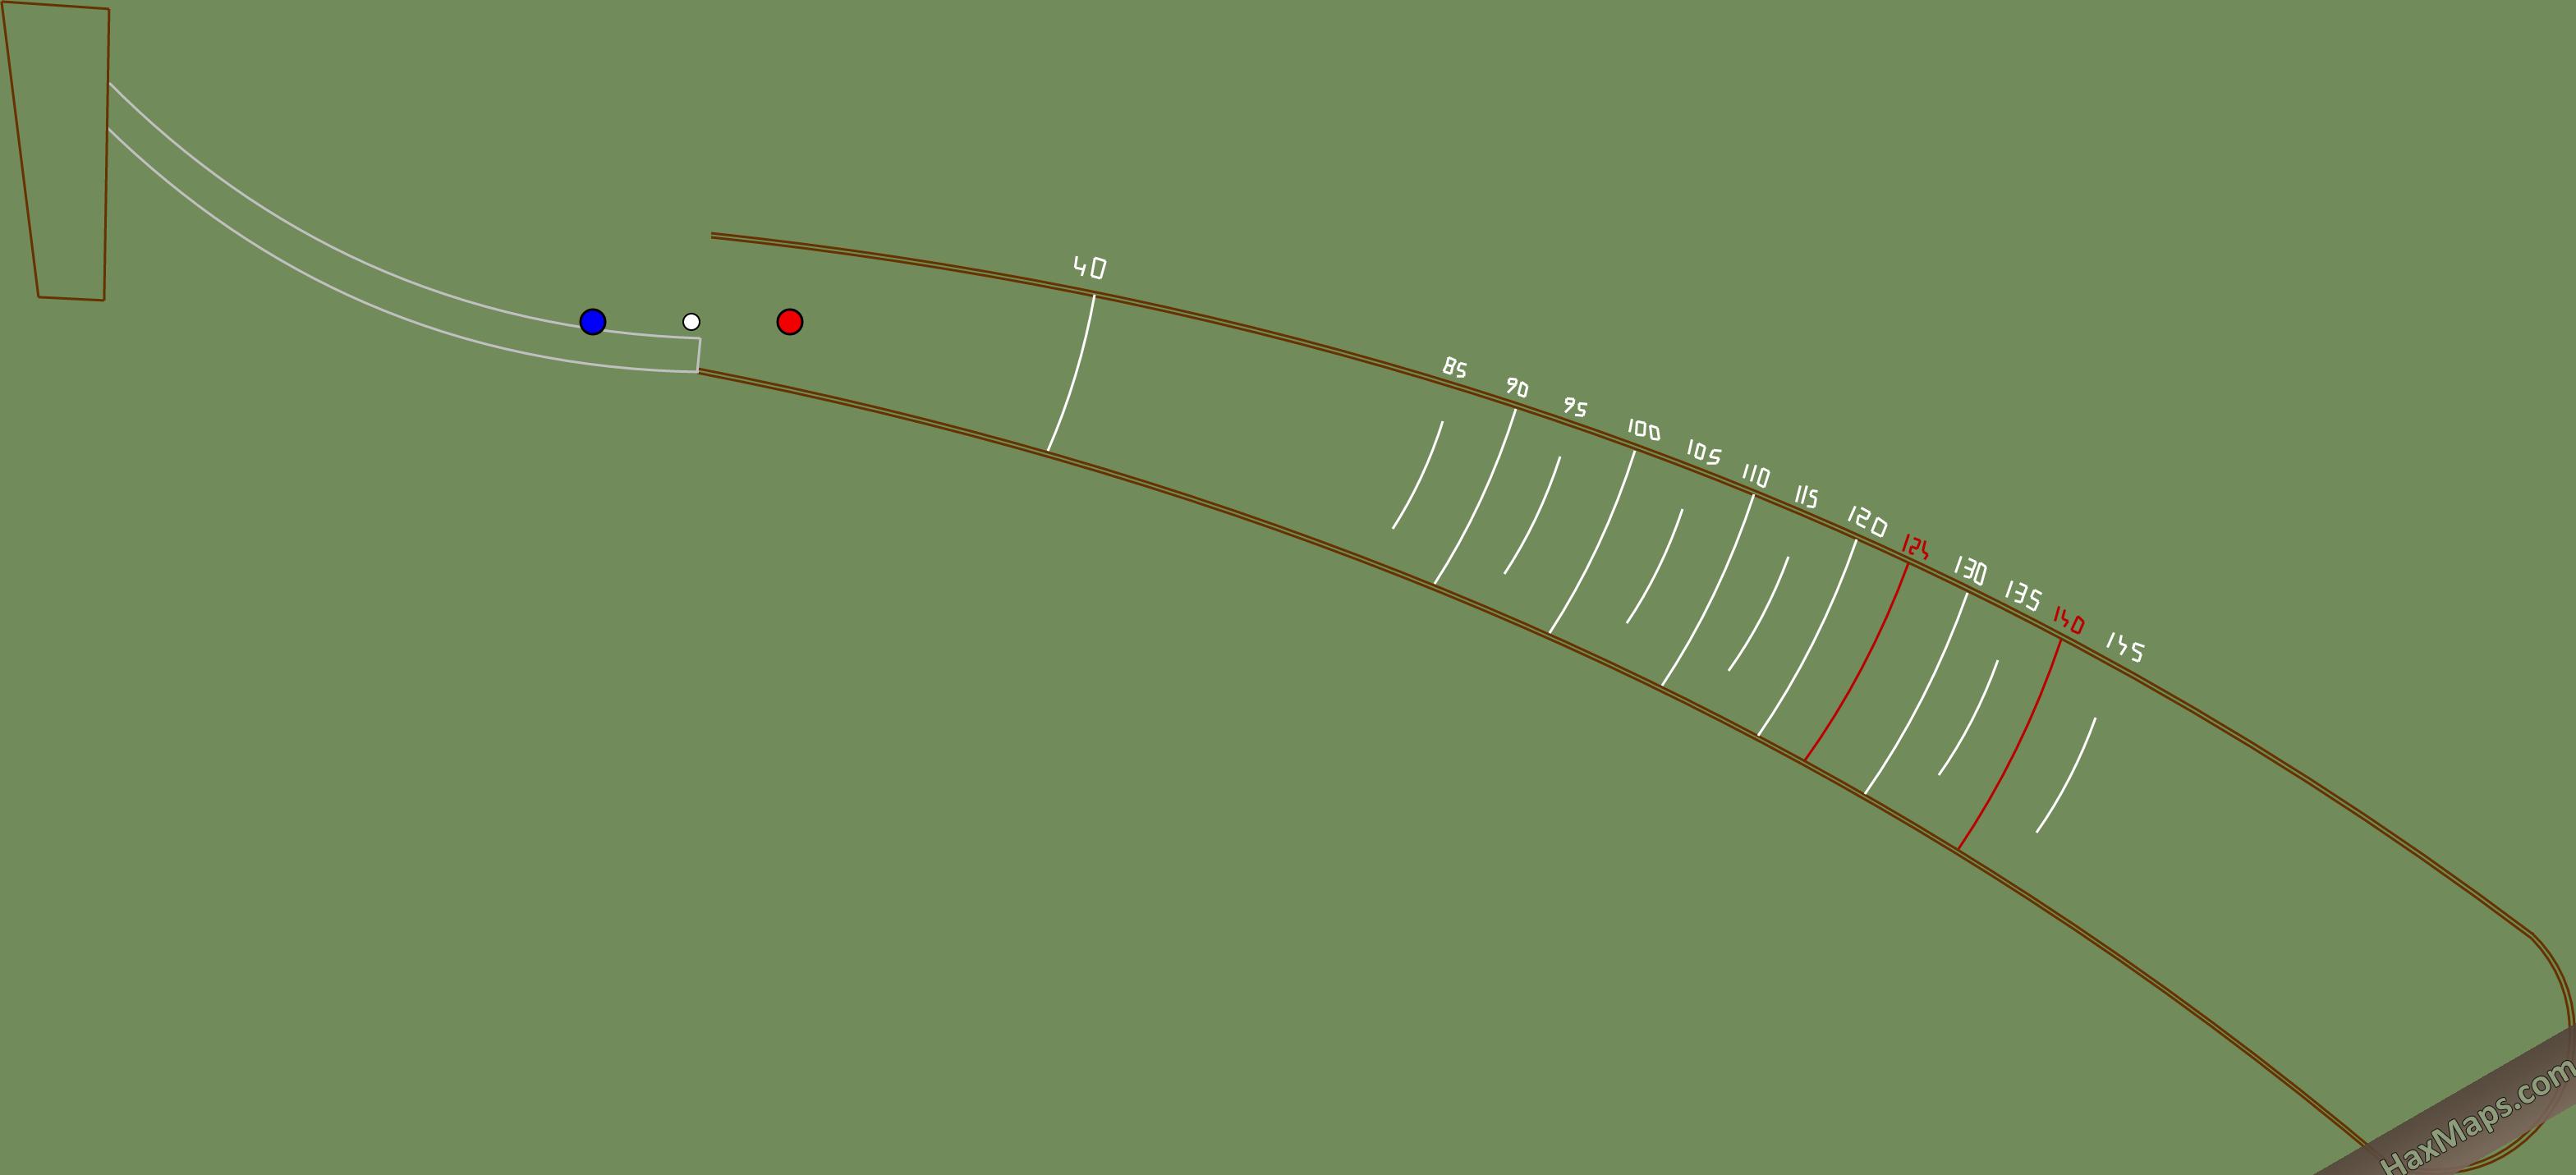 hax ball maps | Trondheim K124 HS140